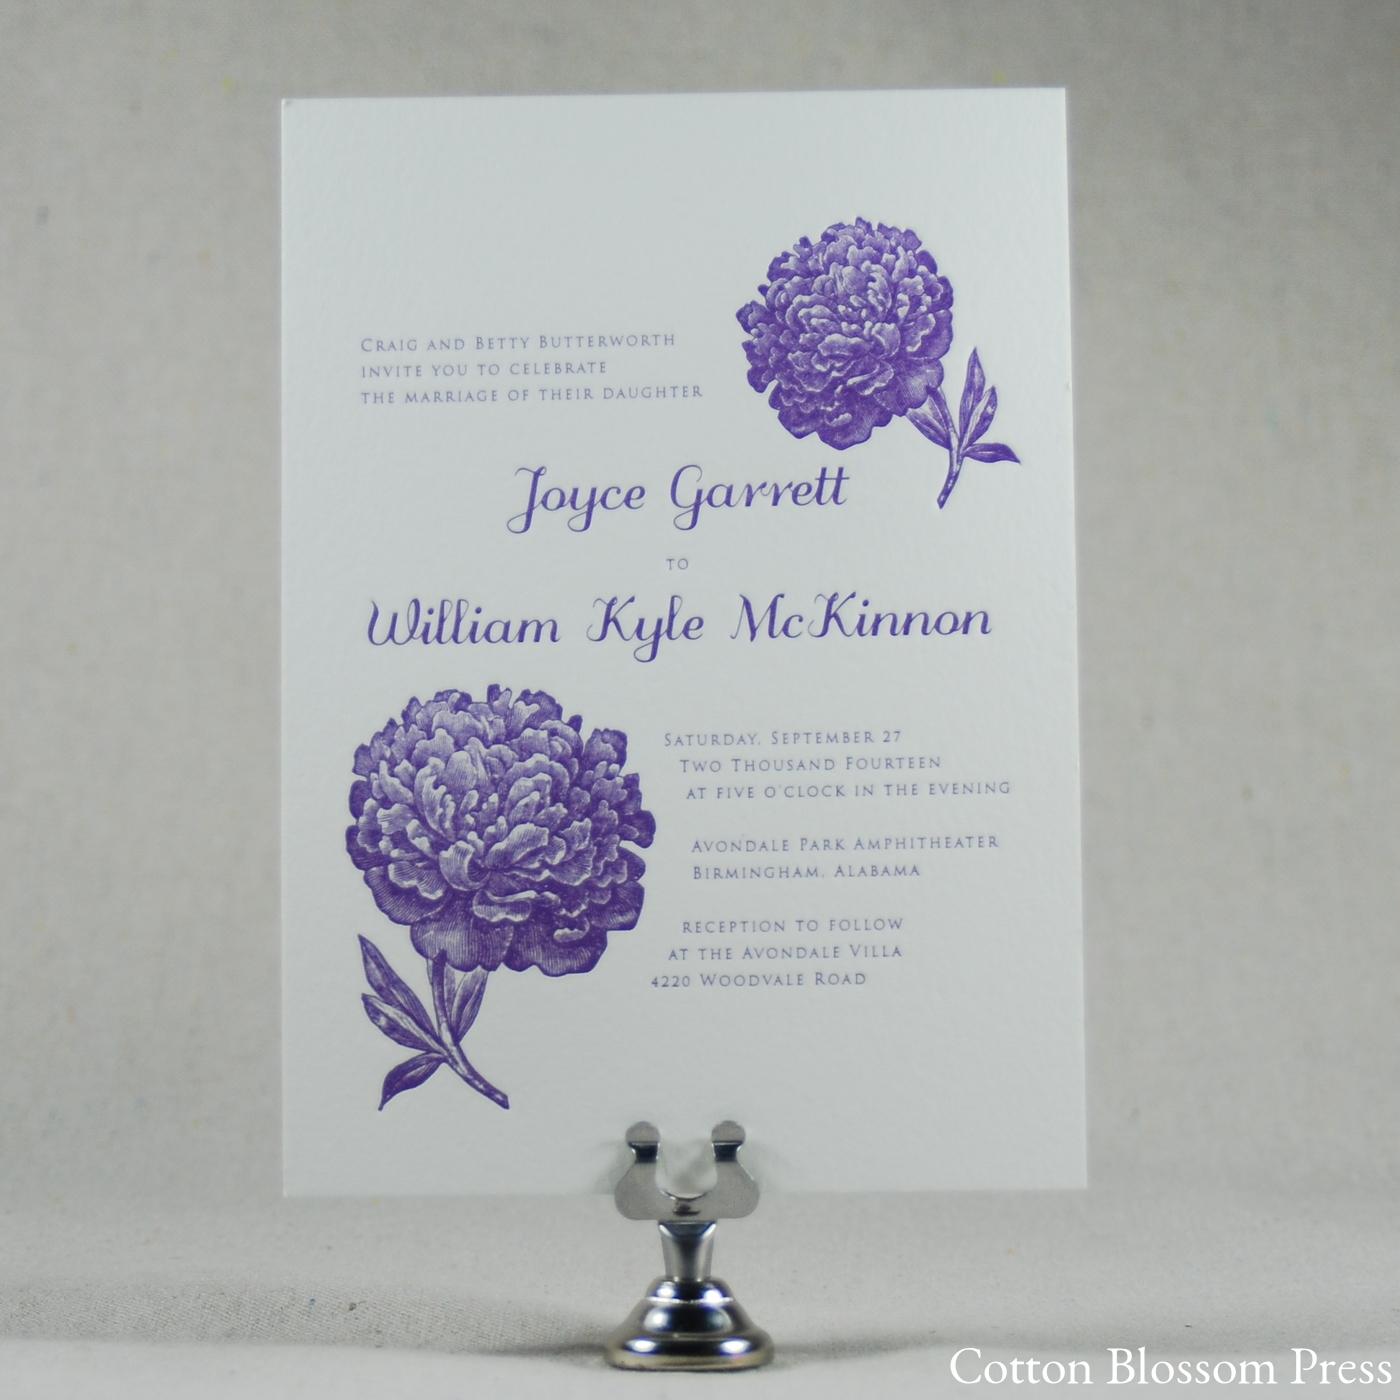 CBP-Wedding_Joyce_Invite.JPG